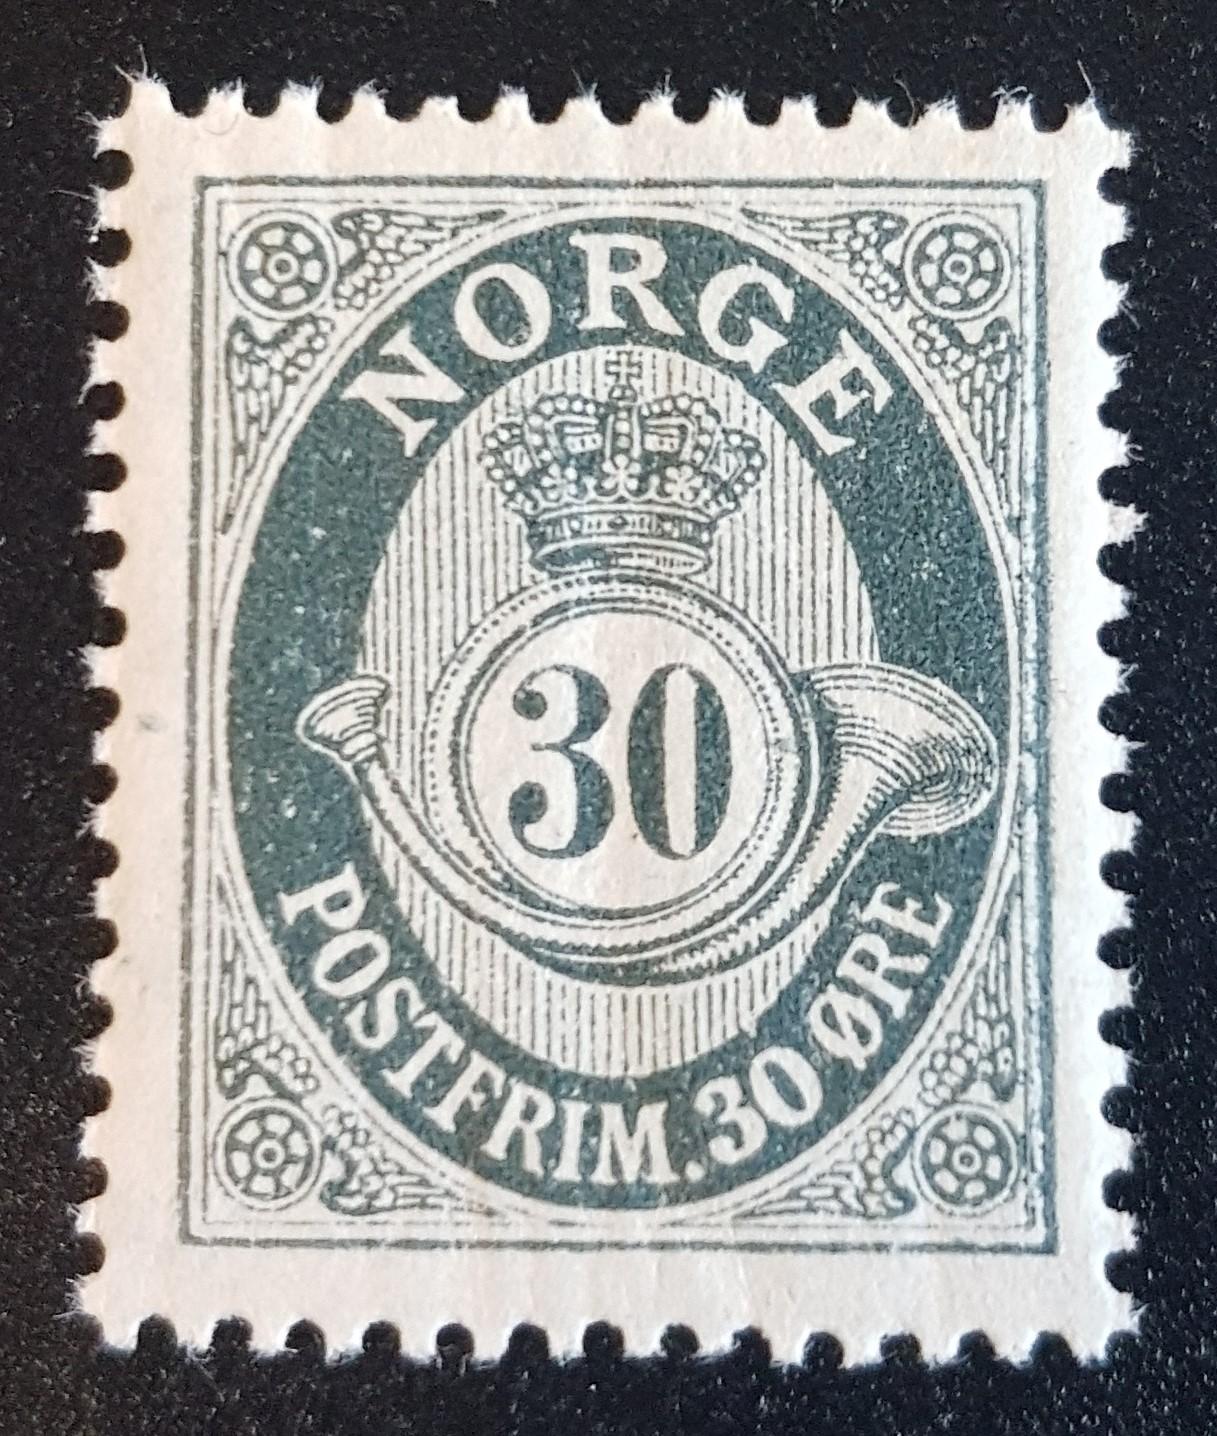 NK 105 i postfrisk kvalitet